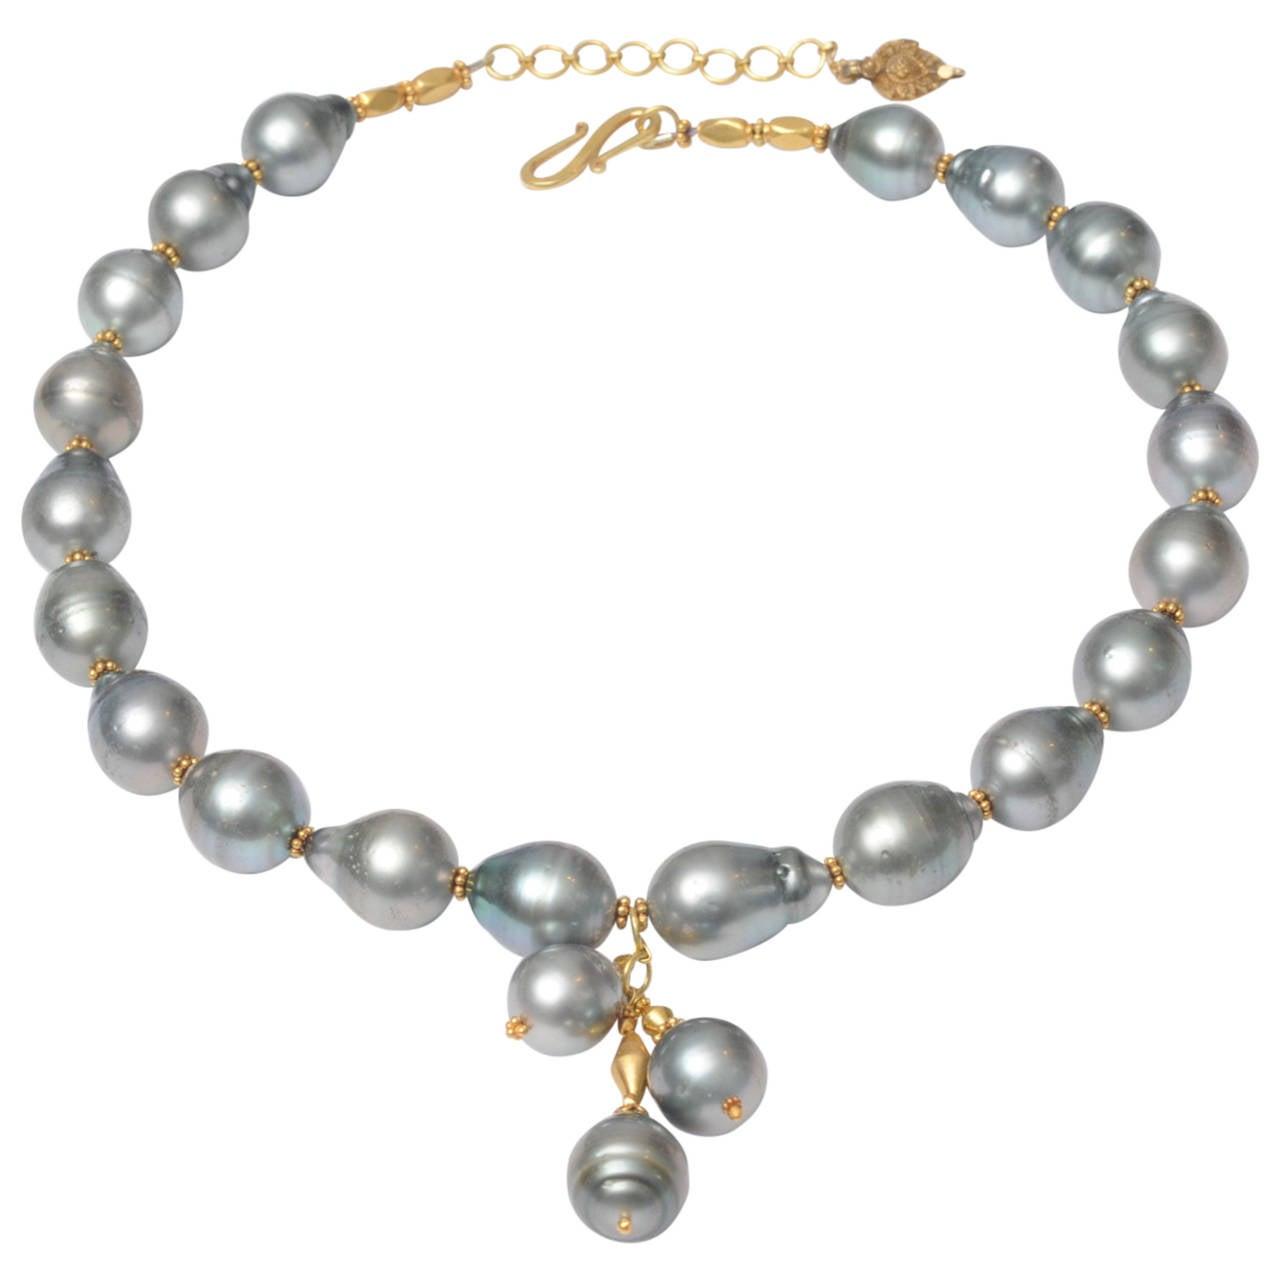 Tahitian Pearls and 18 Karat Gold Necklace by Deborah Lockhart Phillips